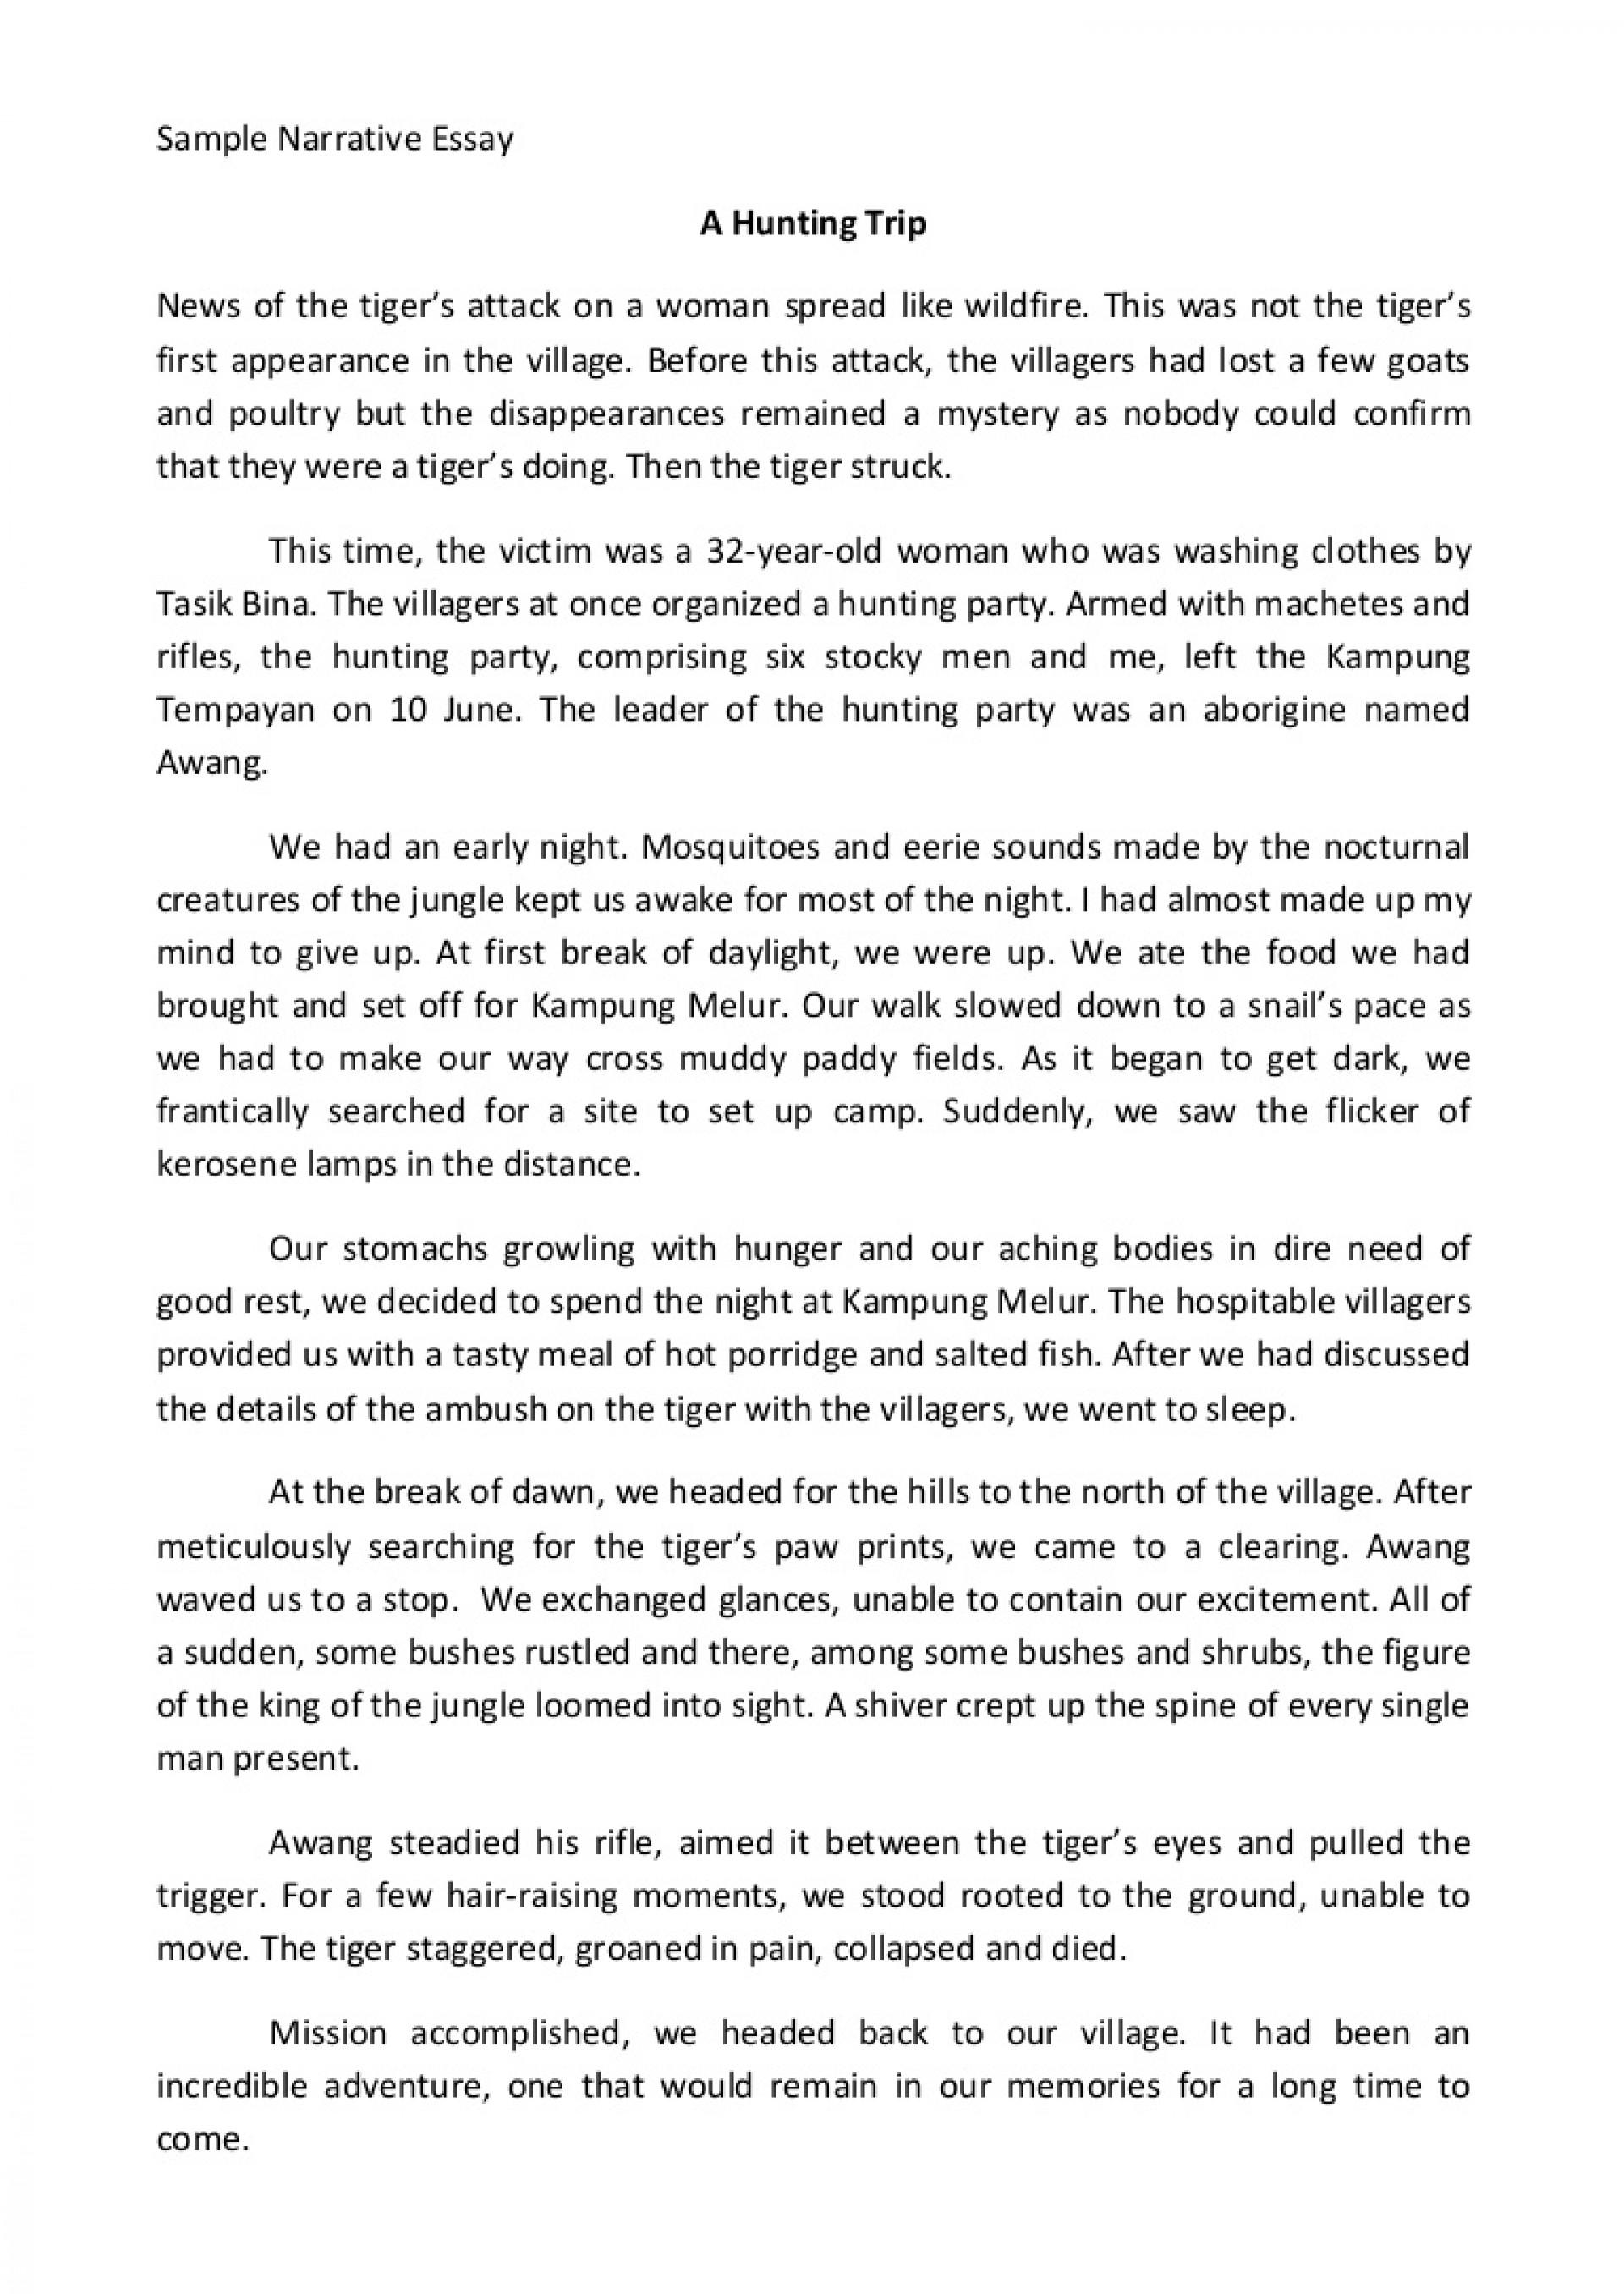 007 Narration Essay Samplenarrativeessay Phpapp02 Thumbnail Unbelievable Narrative Format College Outline Pdf 1920